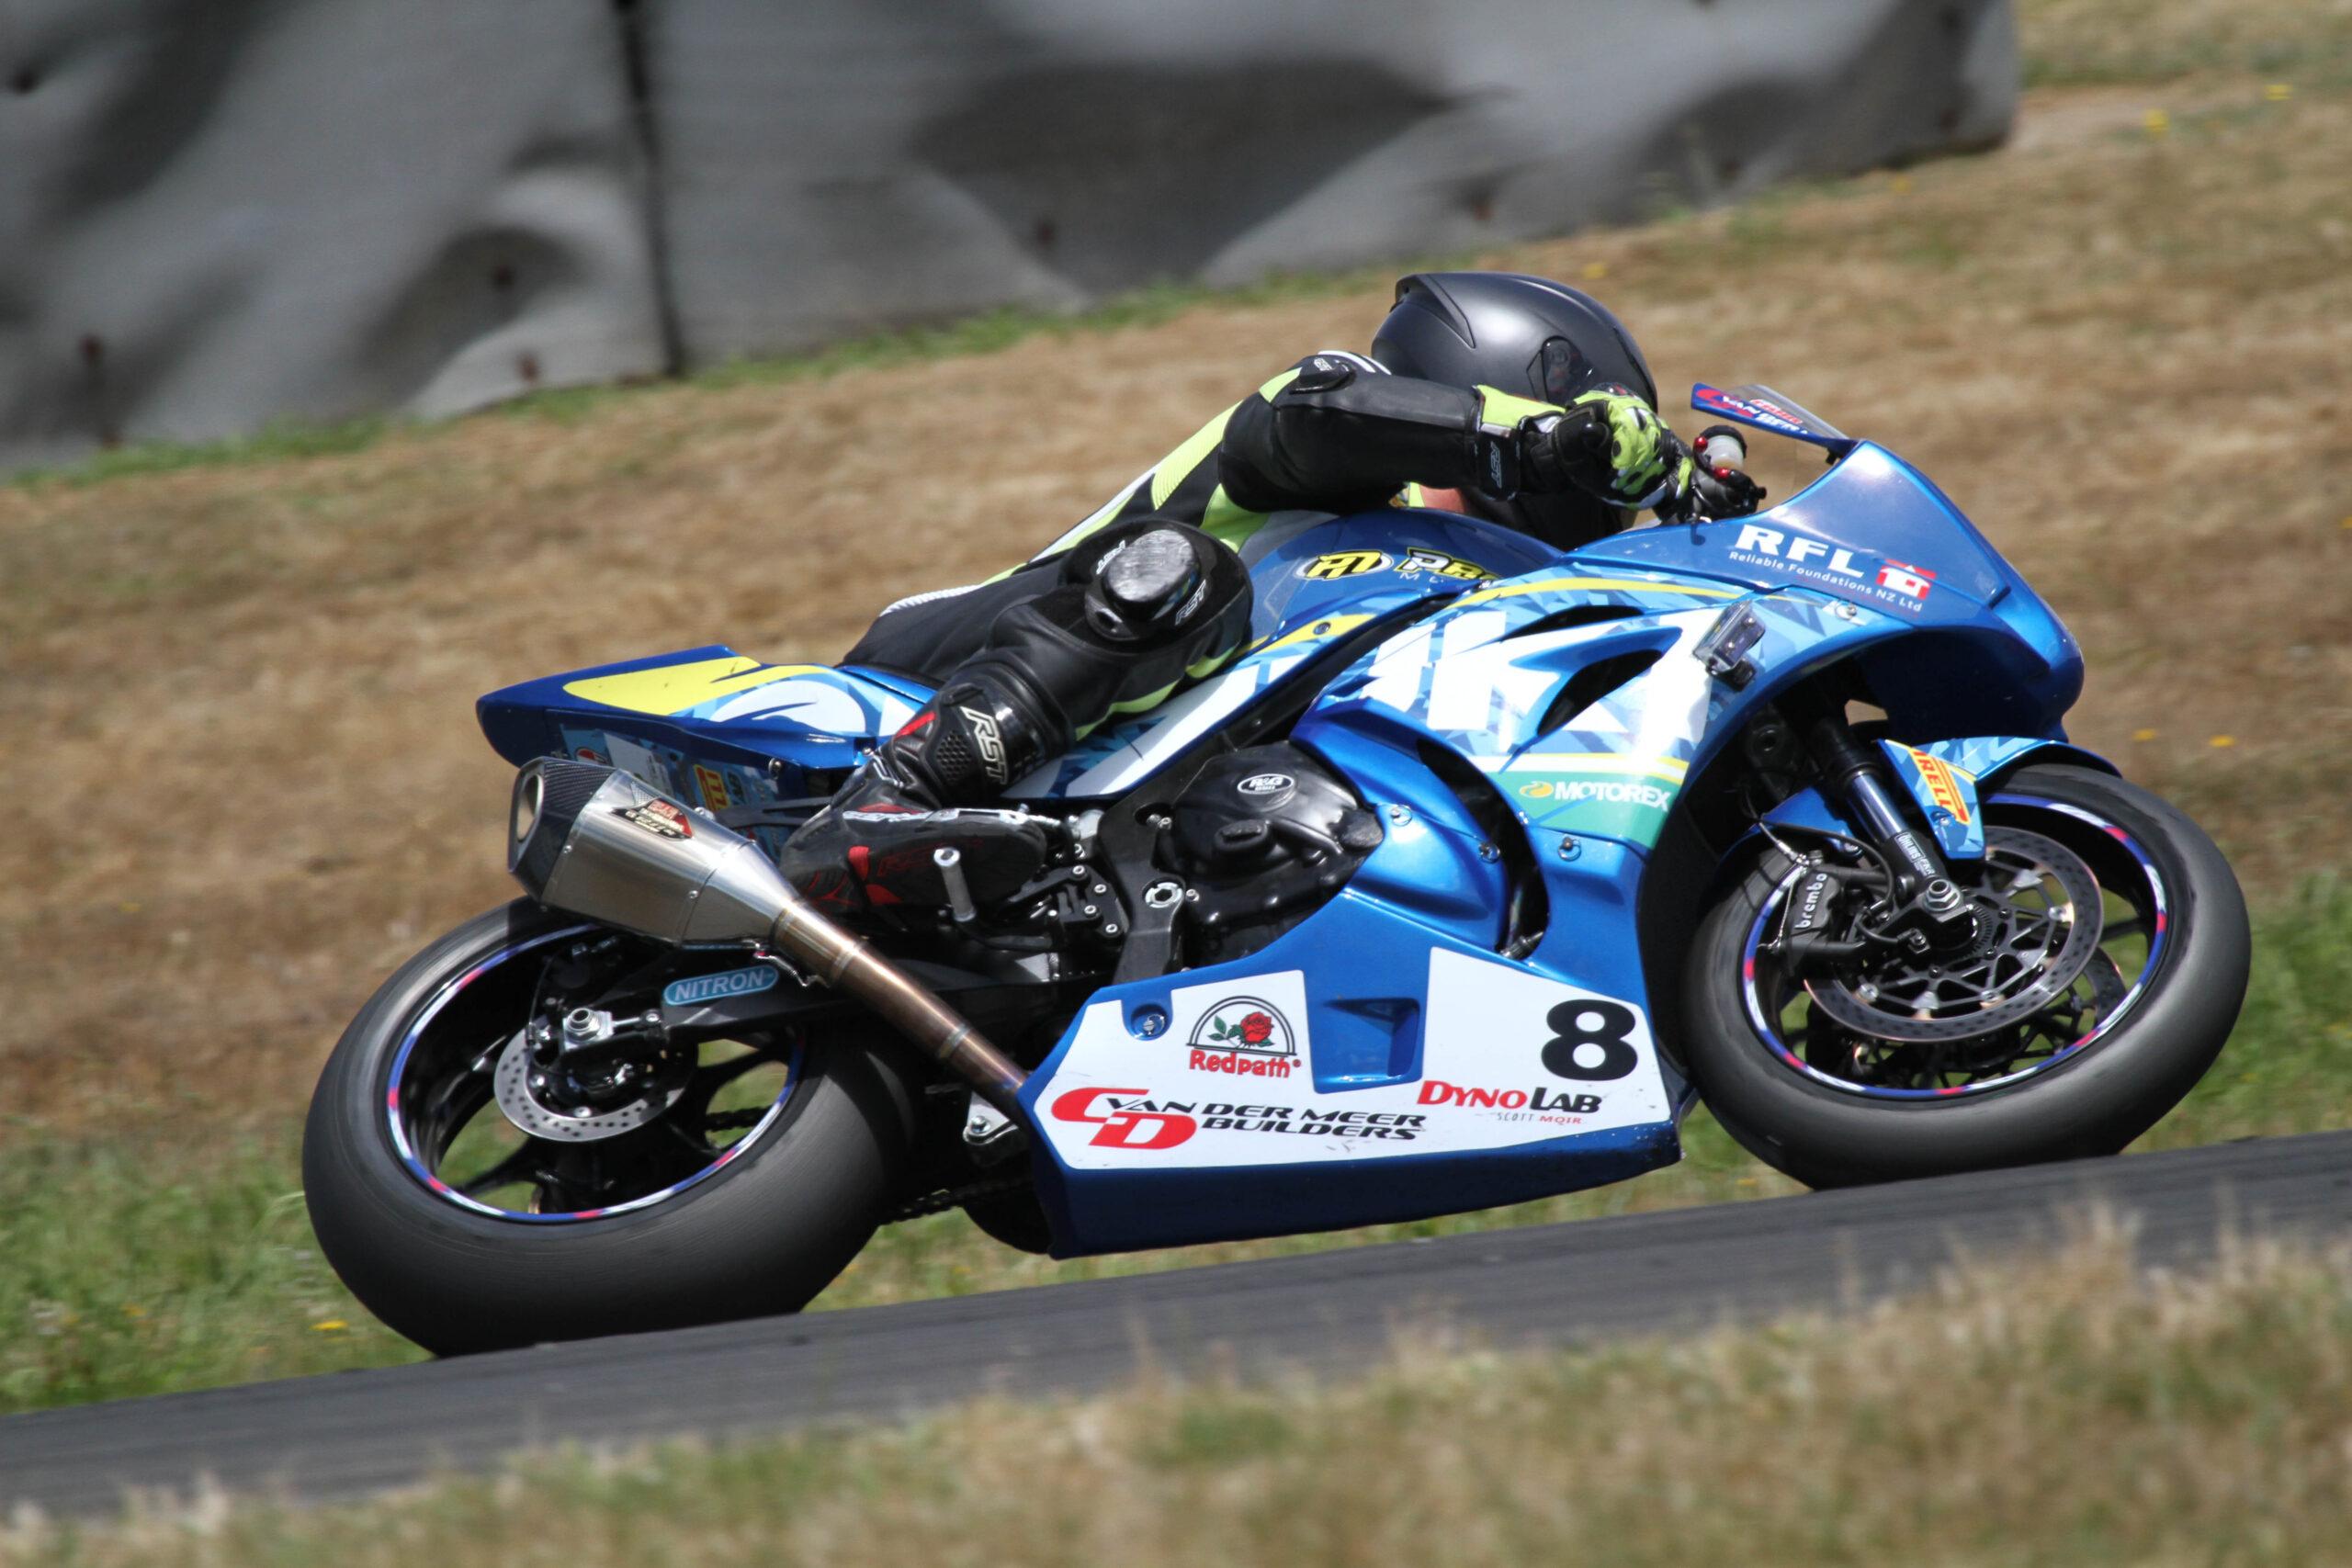 Paeroa: Suzuki New Zealand's Moir Secures Feature Battle Of The Streets Race Crown